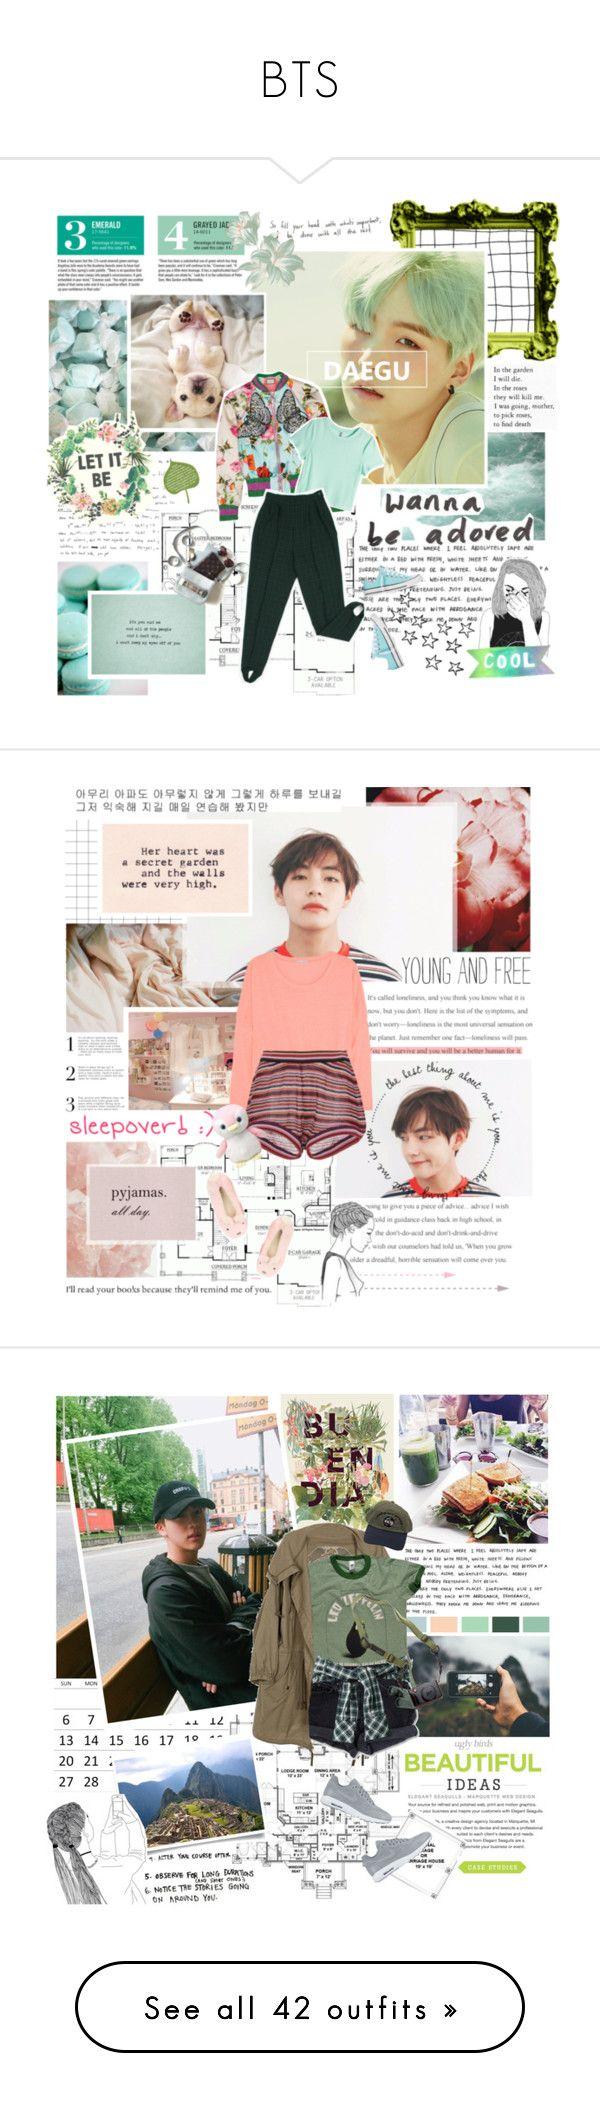 """BTS"" by followmiiin ❤ liked on Polyvore featuring Garance Doré, Gucci, H&M, Converse, Eberjey, Jill Stuart, Dorothy Perkins, kpop, sleep and sleepover"